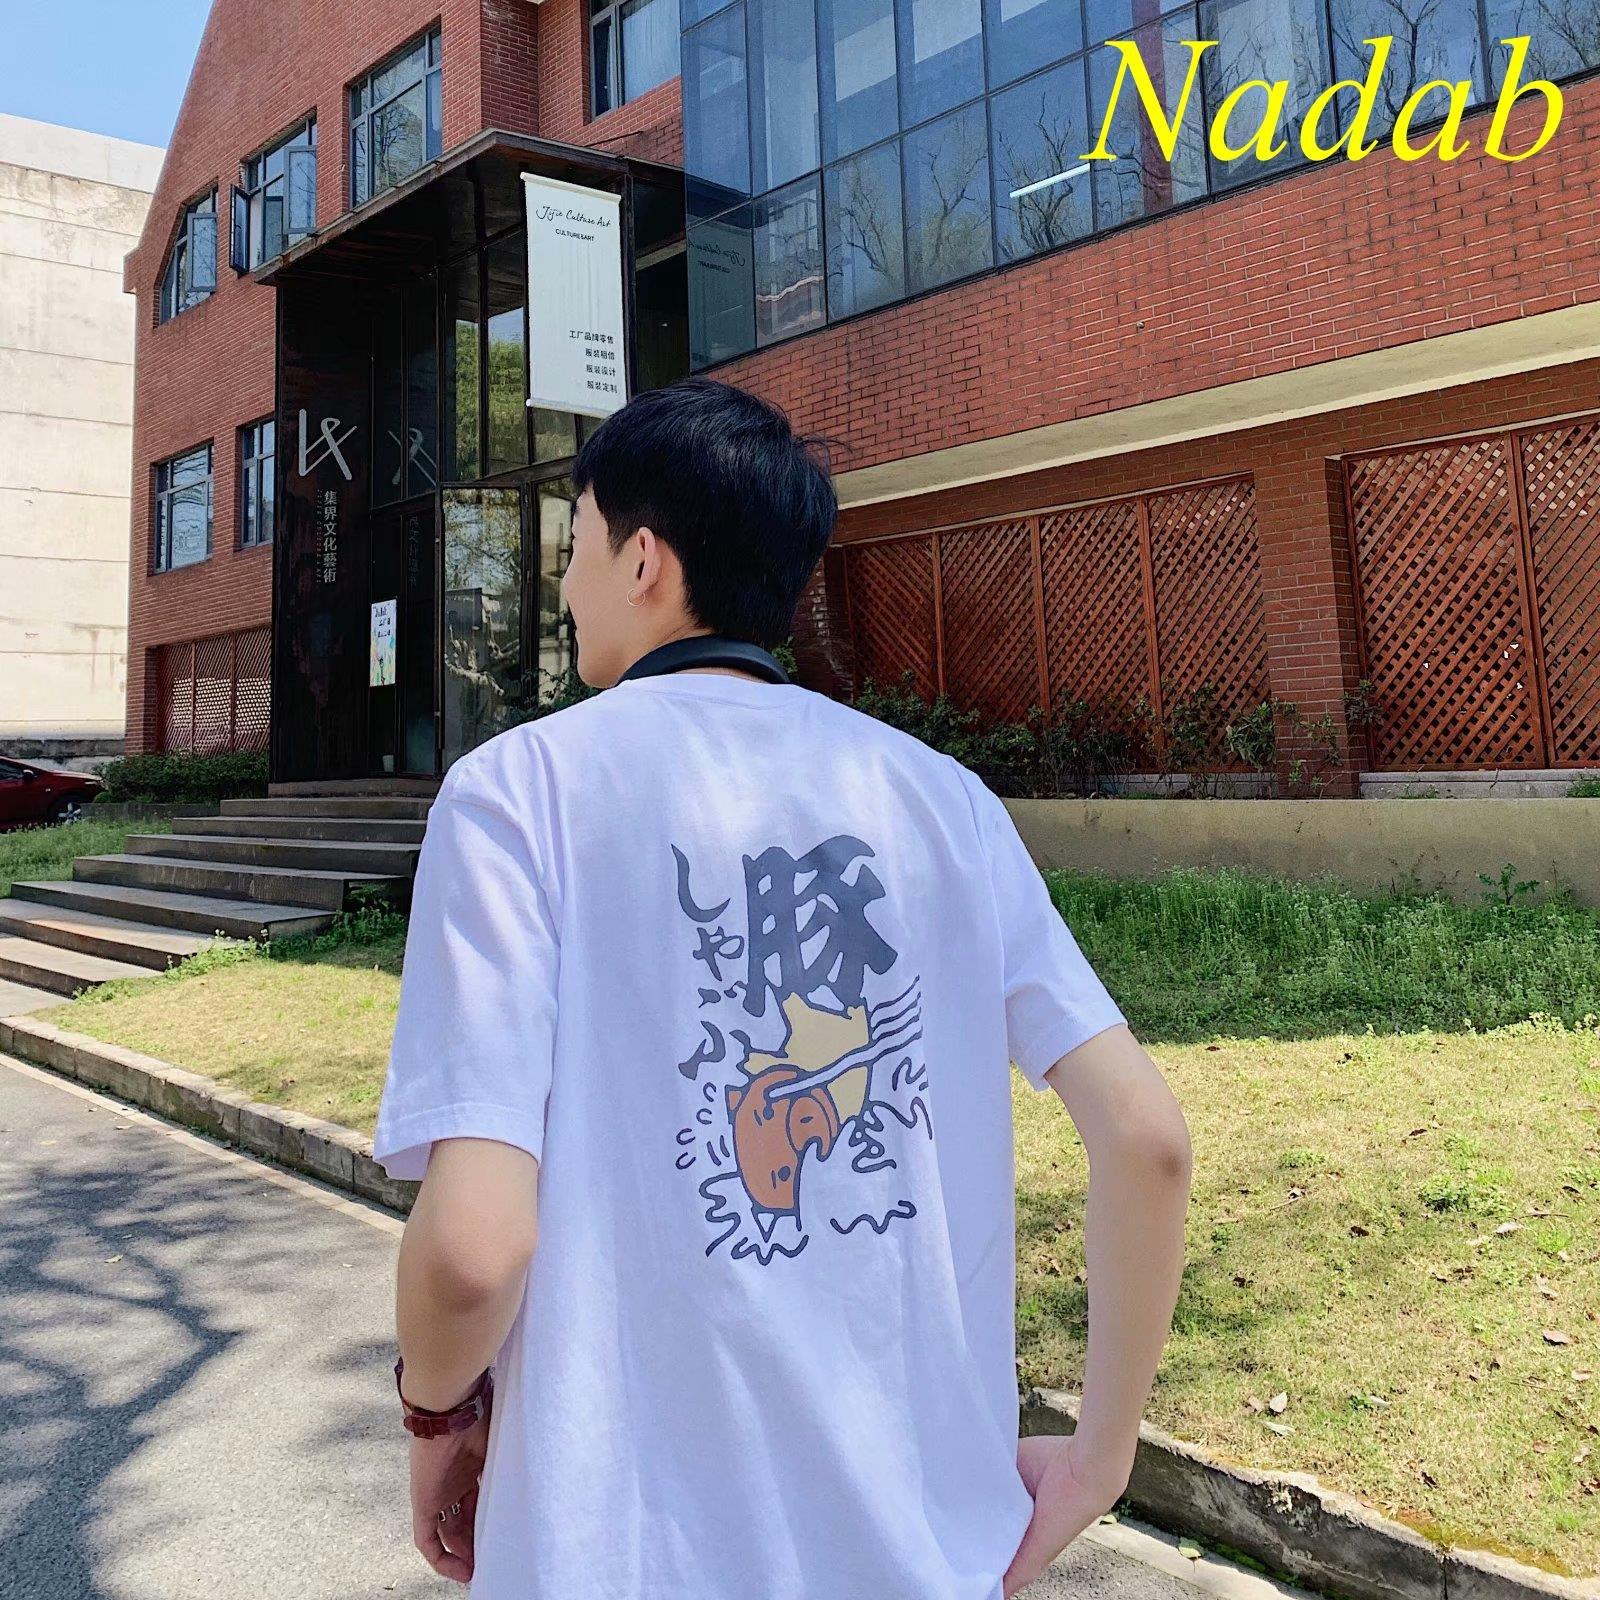 【Nabad】五分袖T恤男韓版潮流OVERSIZE半袖BF男士港風寬松潮牌INS短袖體桖